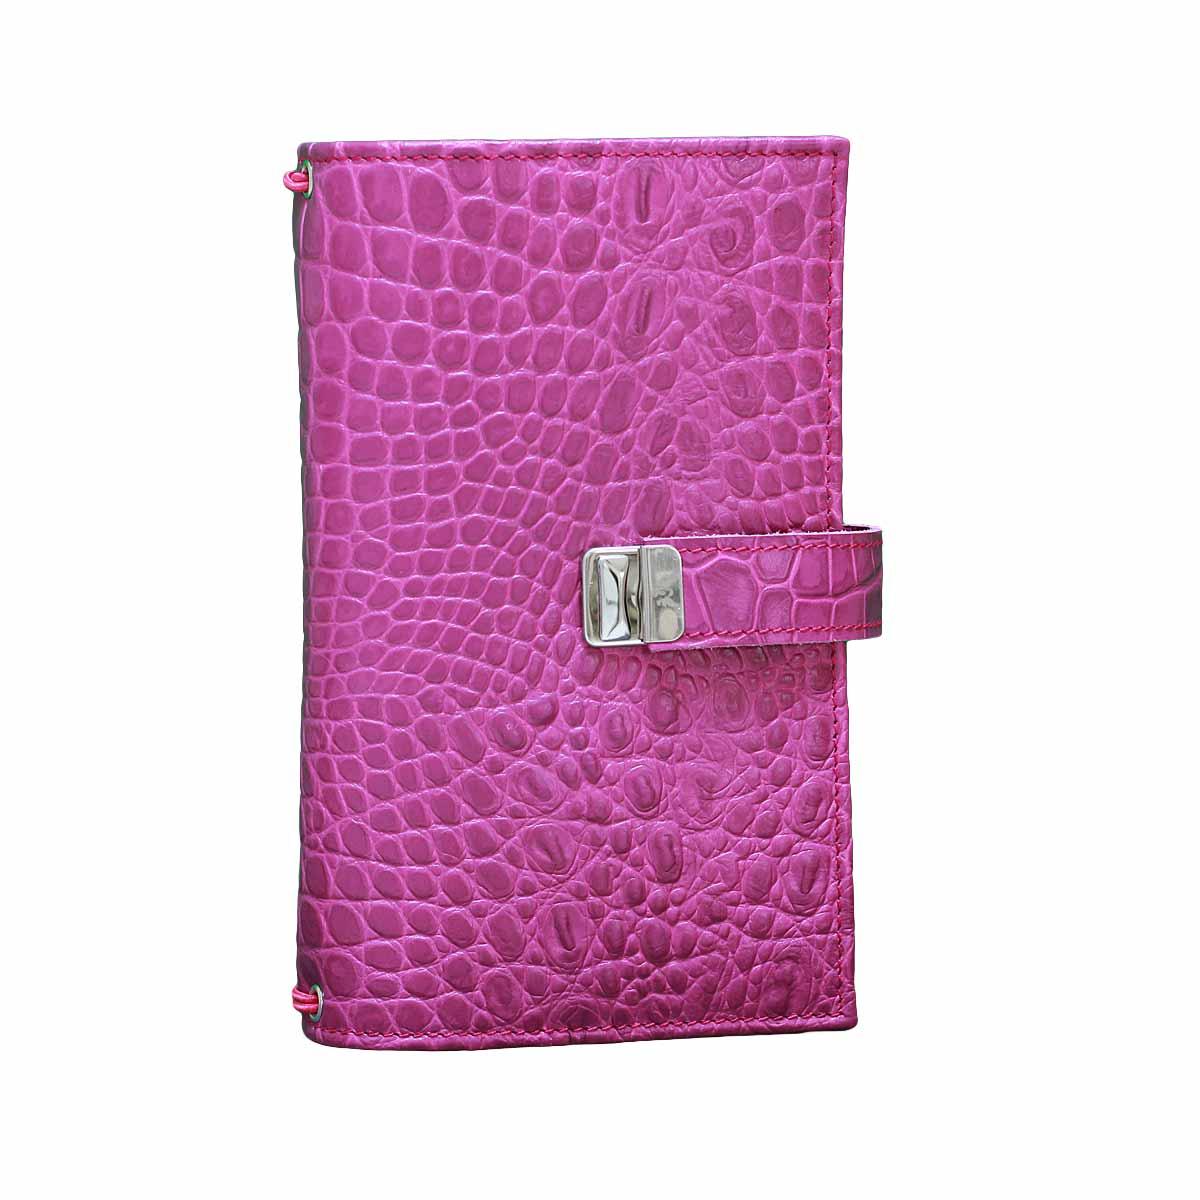 travelers notebook regular pink kroko